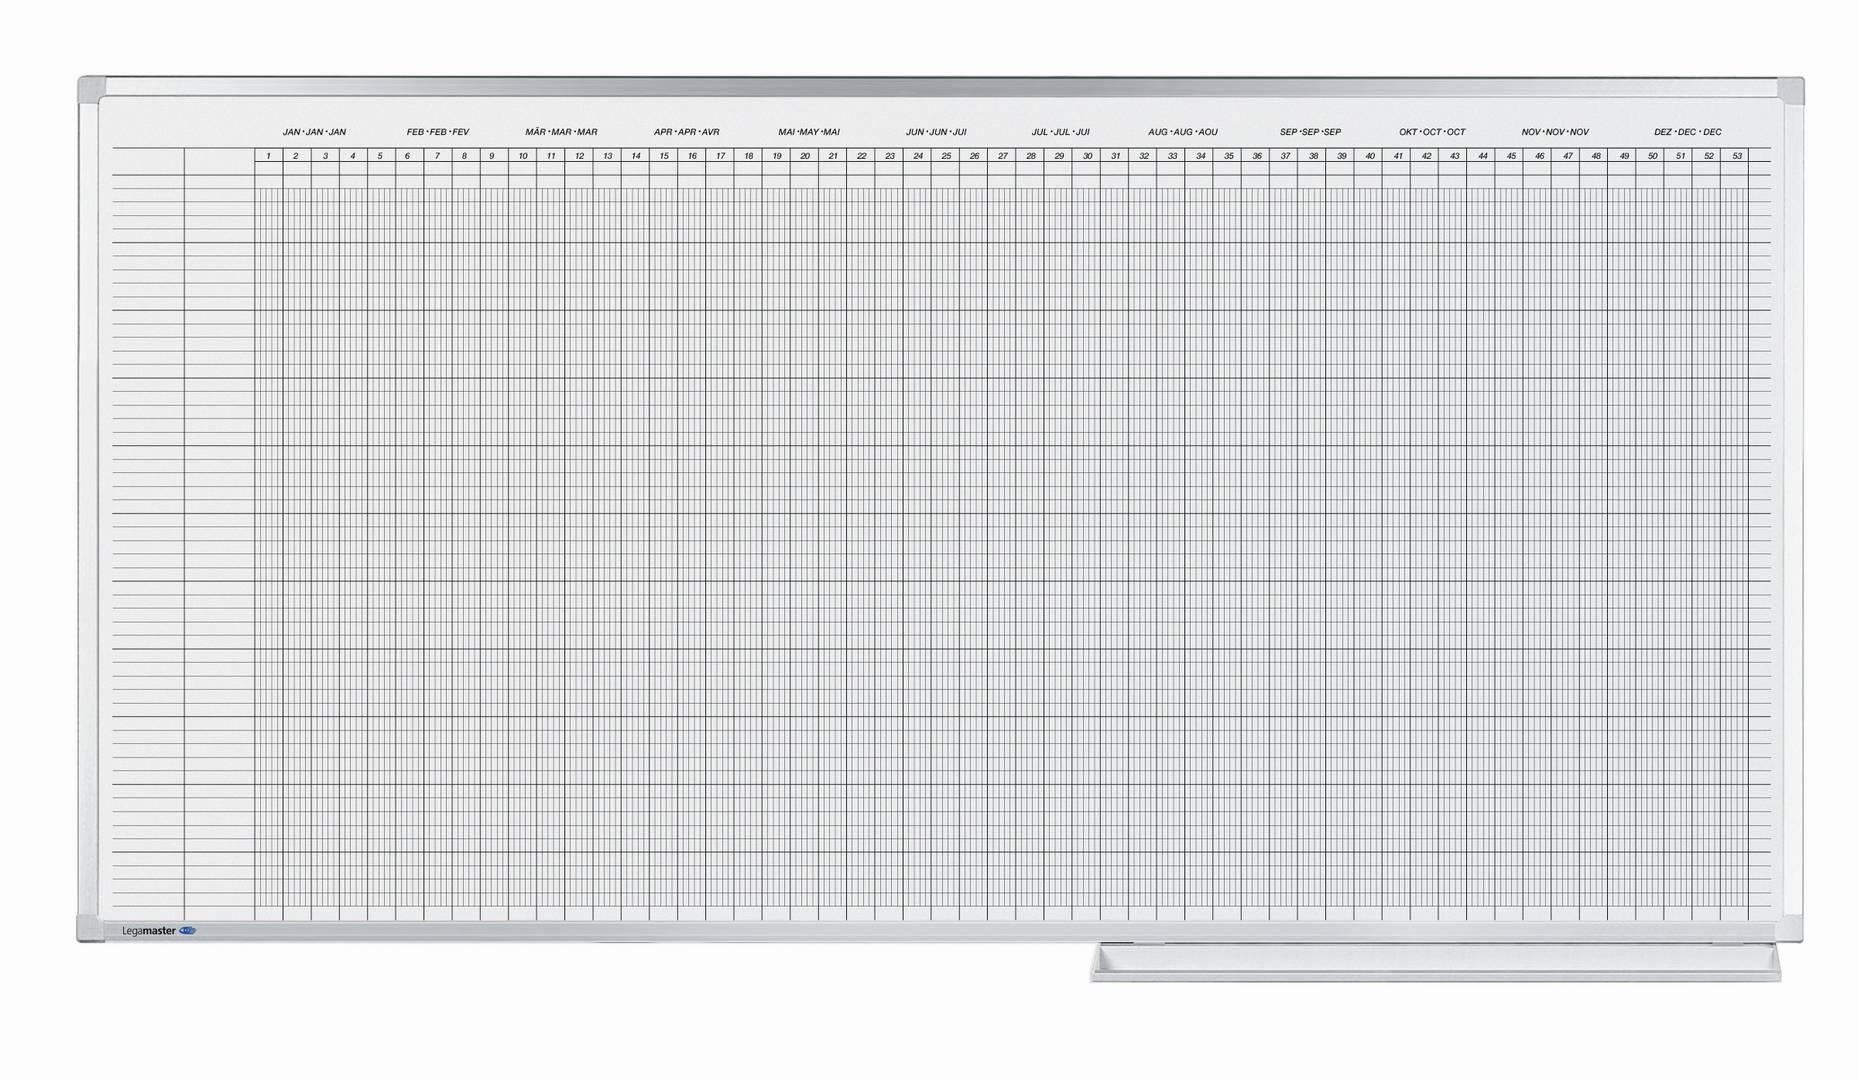 PROFESSIONAL roční plánovací tabule (30 polí) 50x150 cm